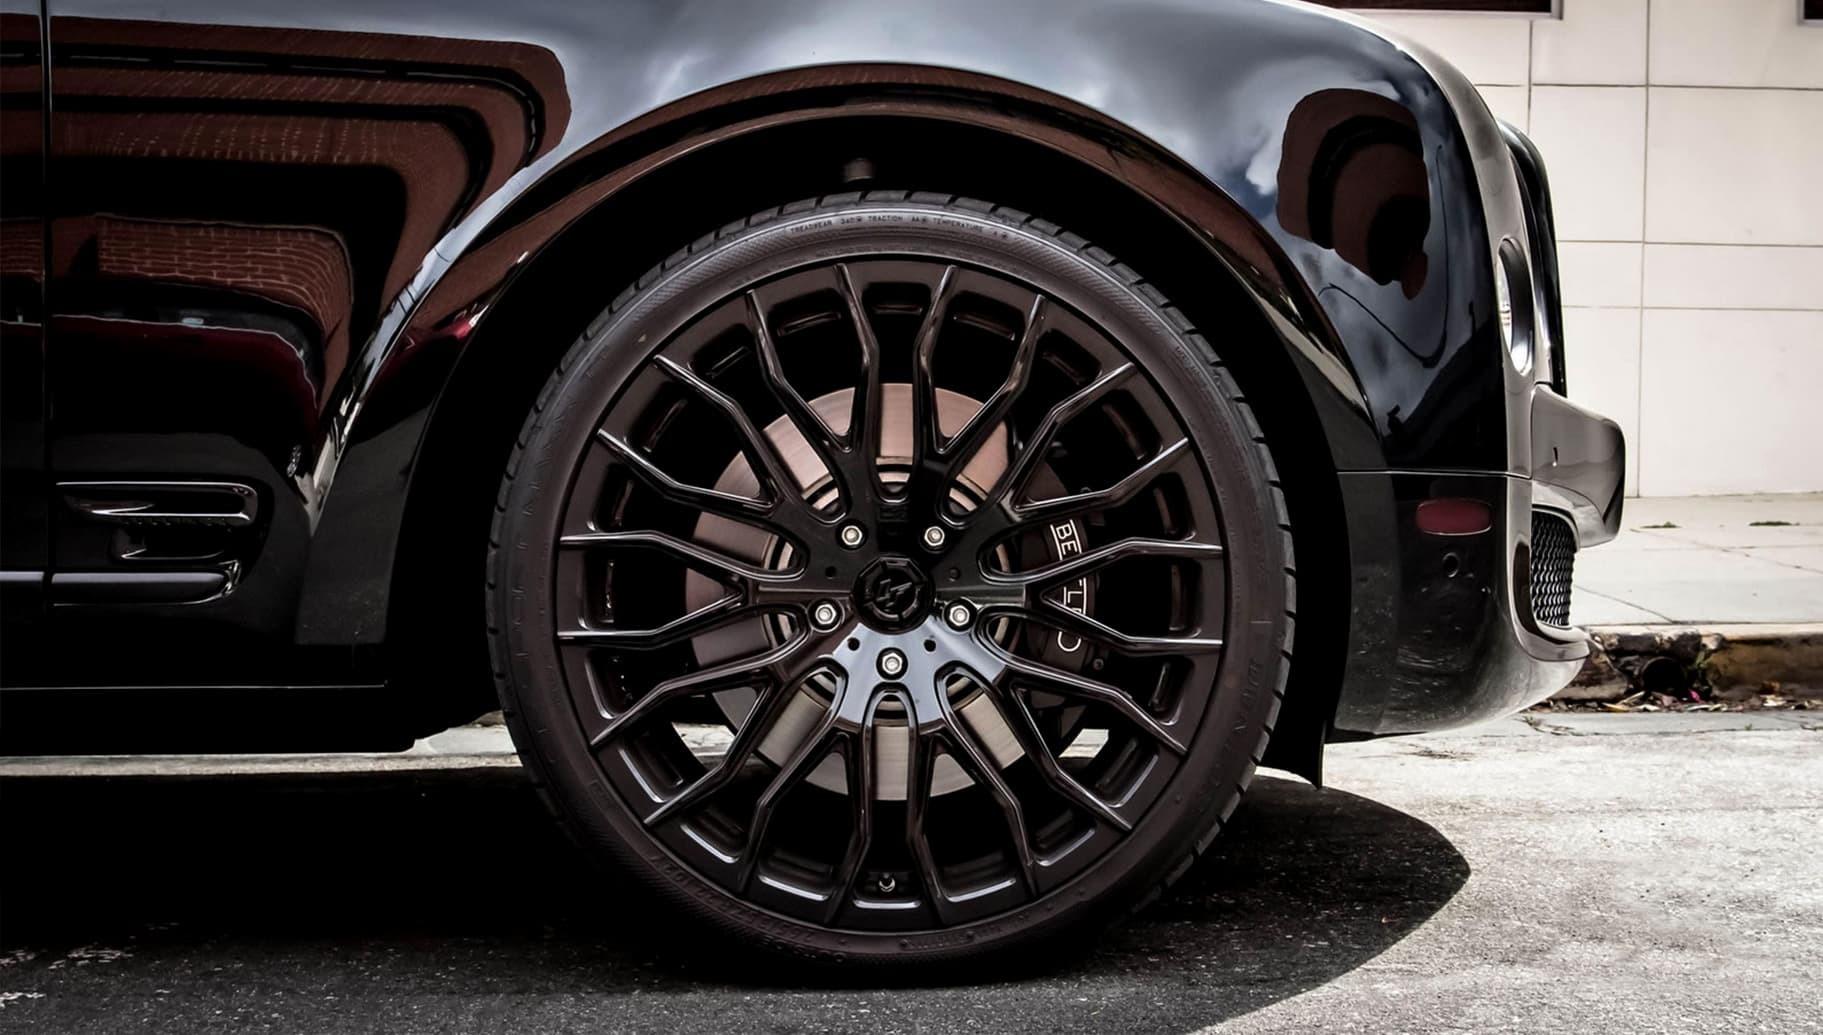 All black LZ-104 on the 2014 Bentley Mulsanne.